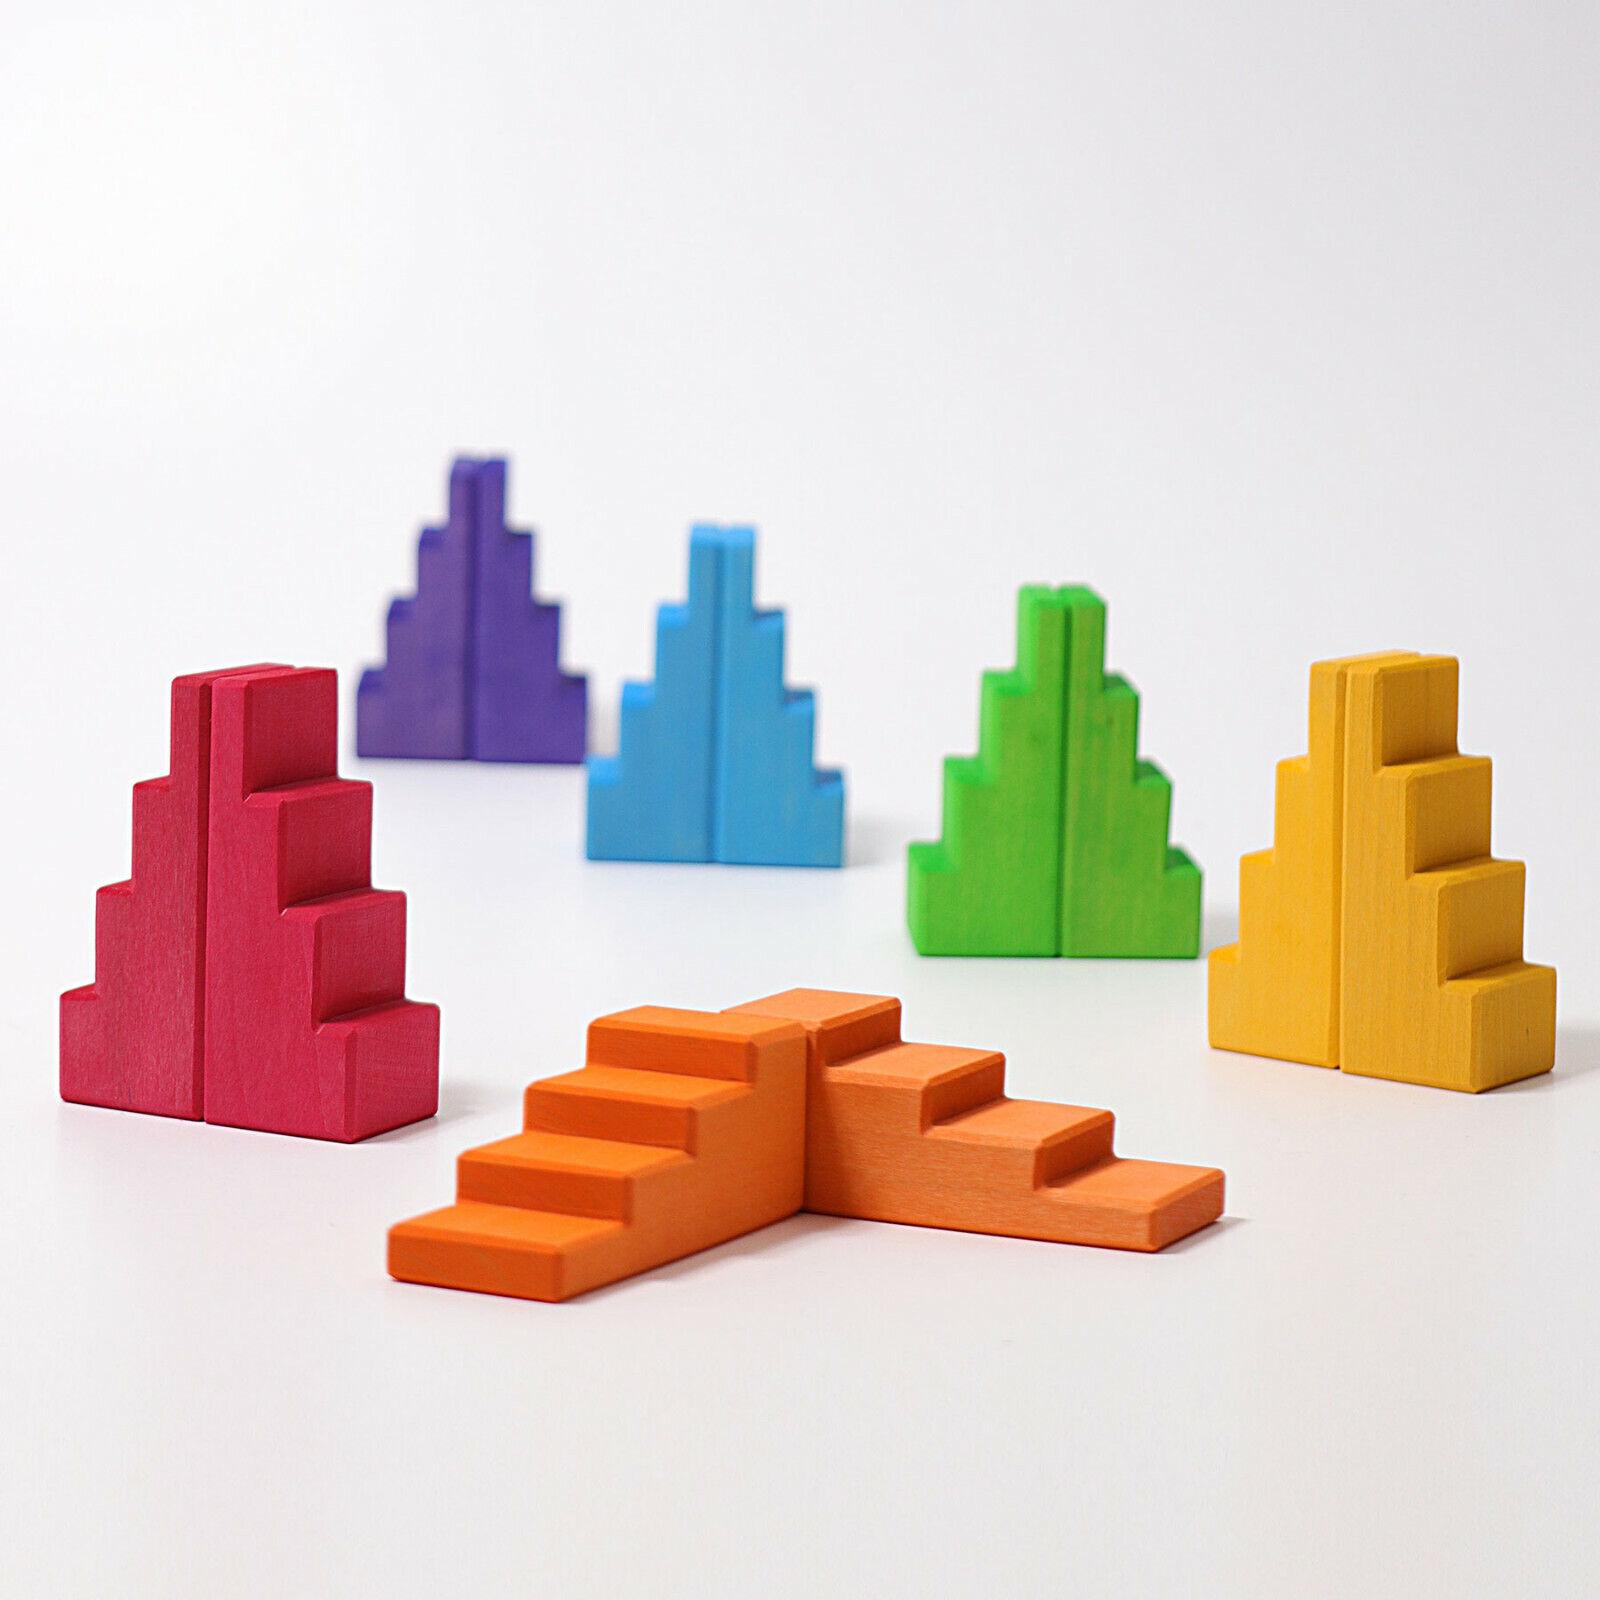 Grimm's Game and Wood Design 42098 Treppendächer Rainbow Multicolour Novelty